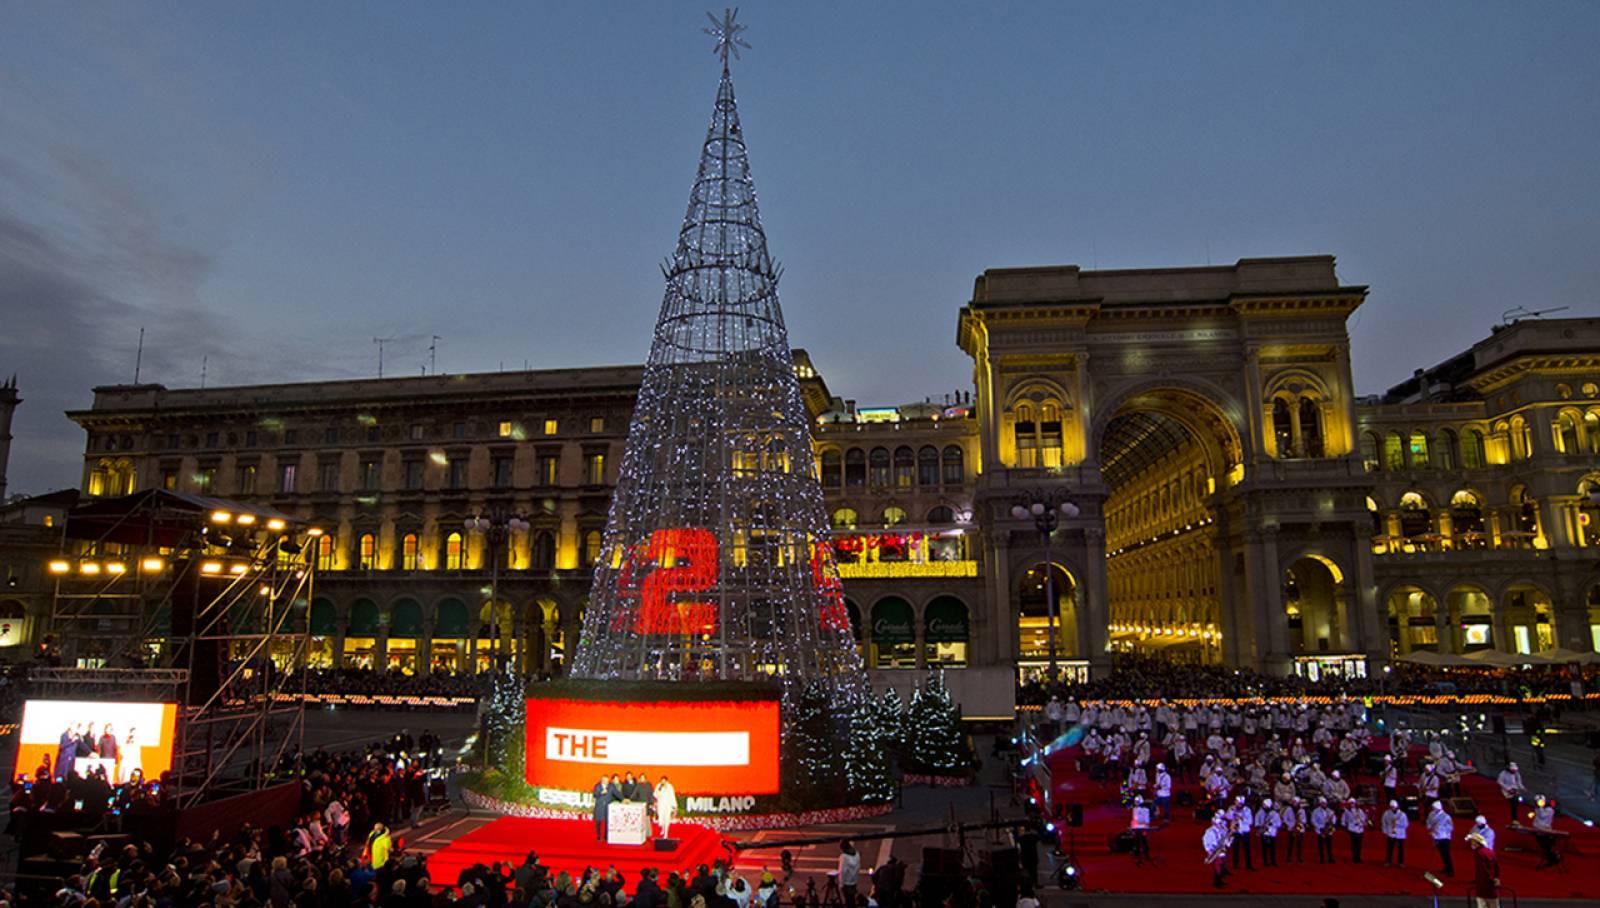 IGPDecaux per Esselunga albero di Natale Piazza Duomo Milano 2019